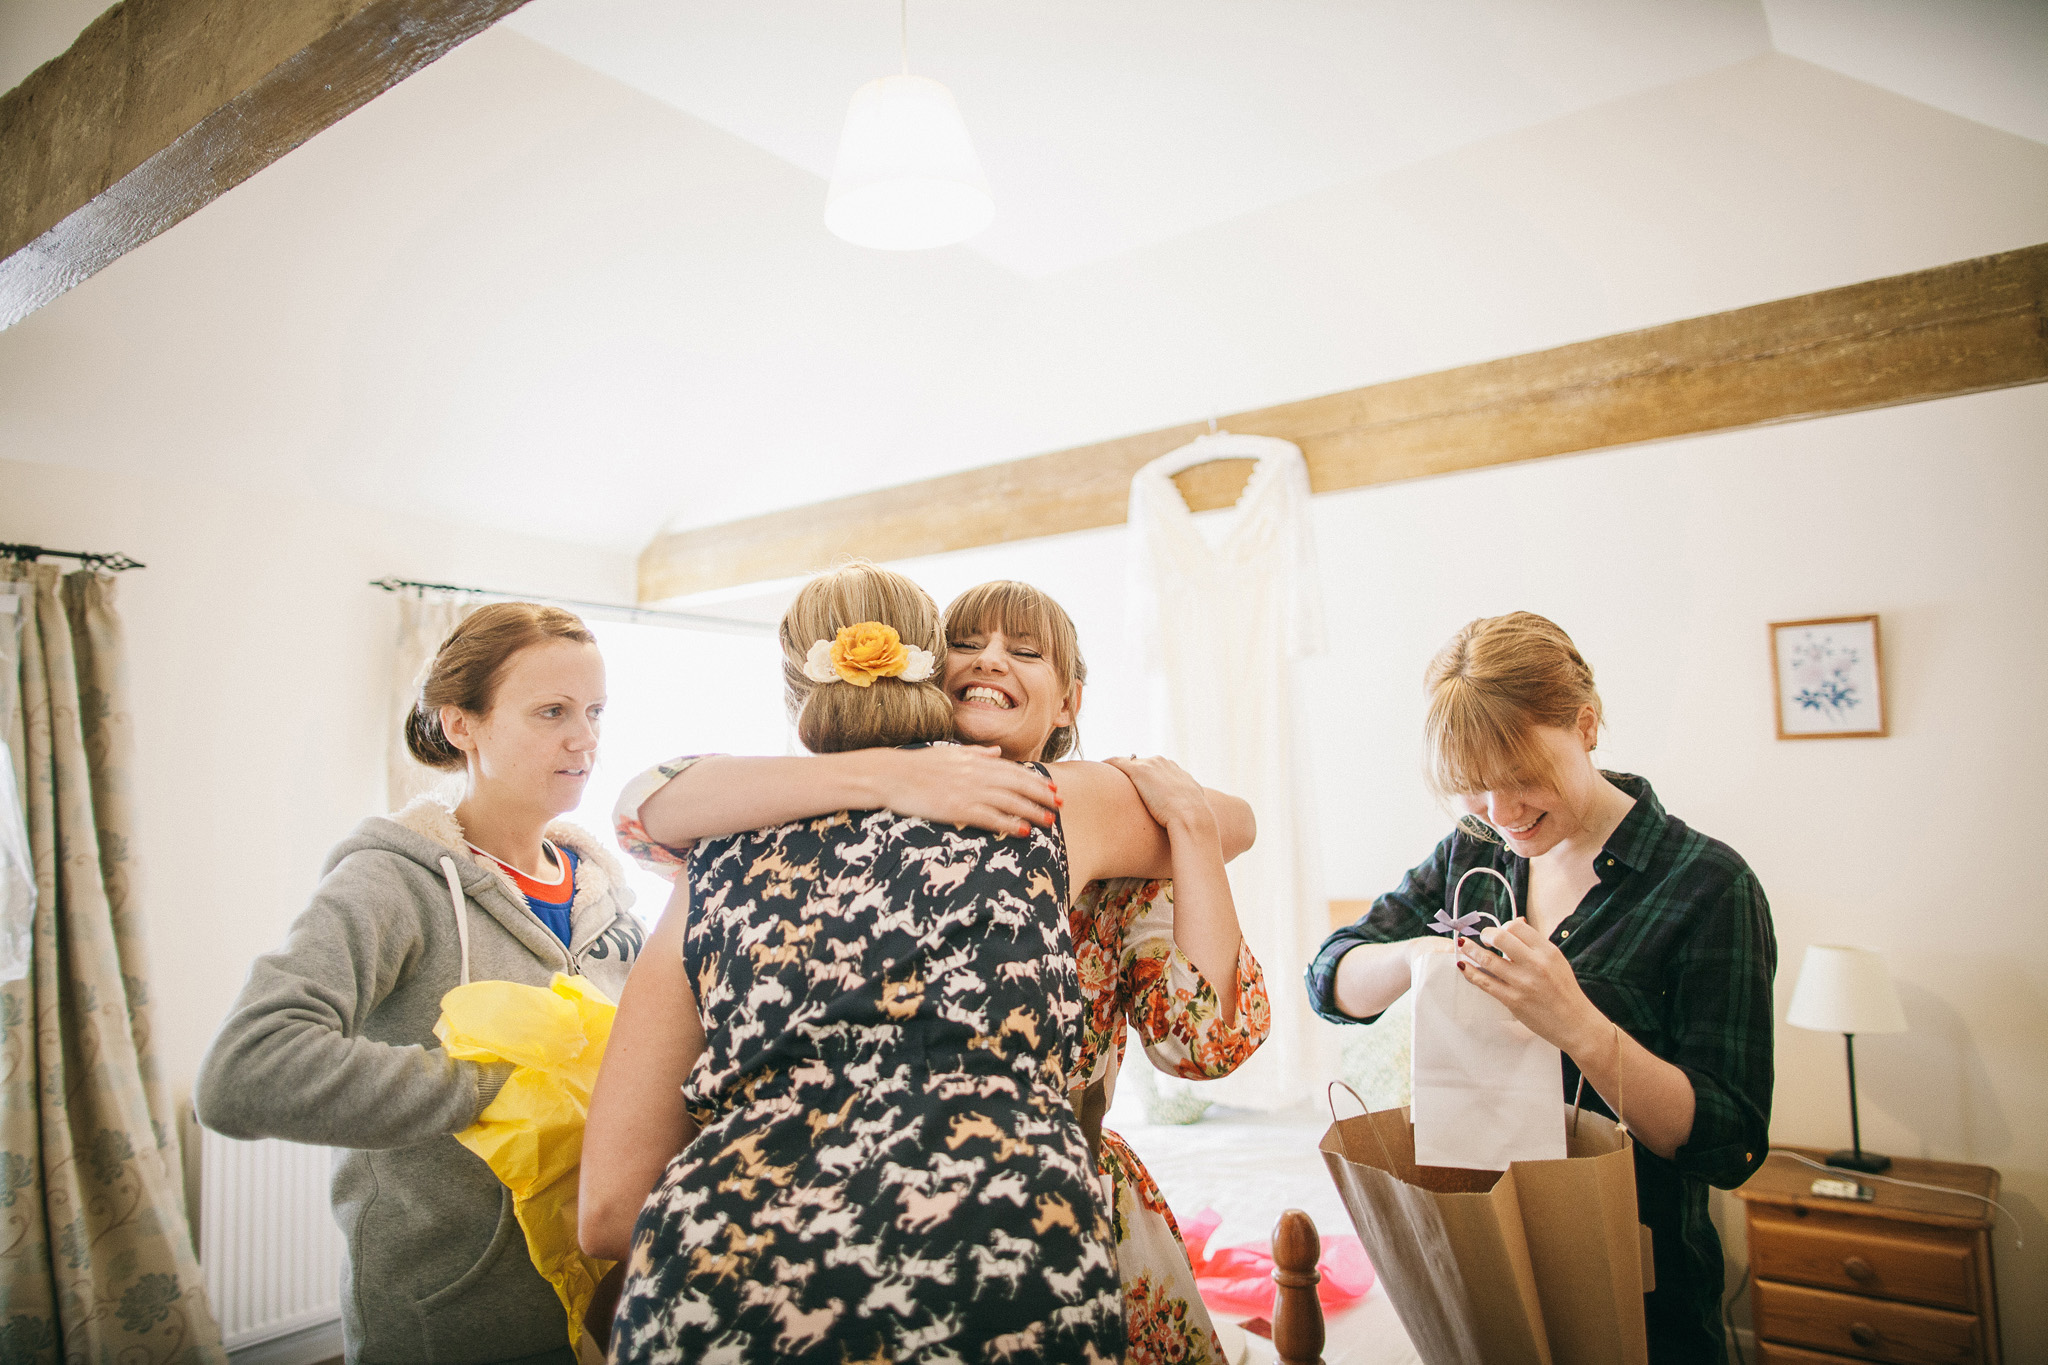 chantry_sussex_barn_wedding_283.jpg